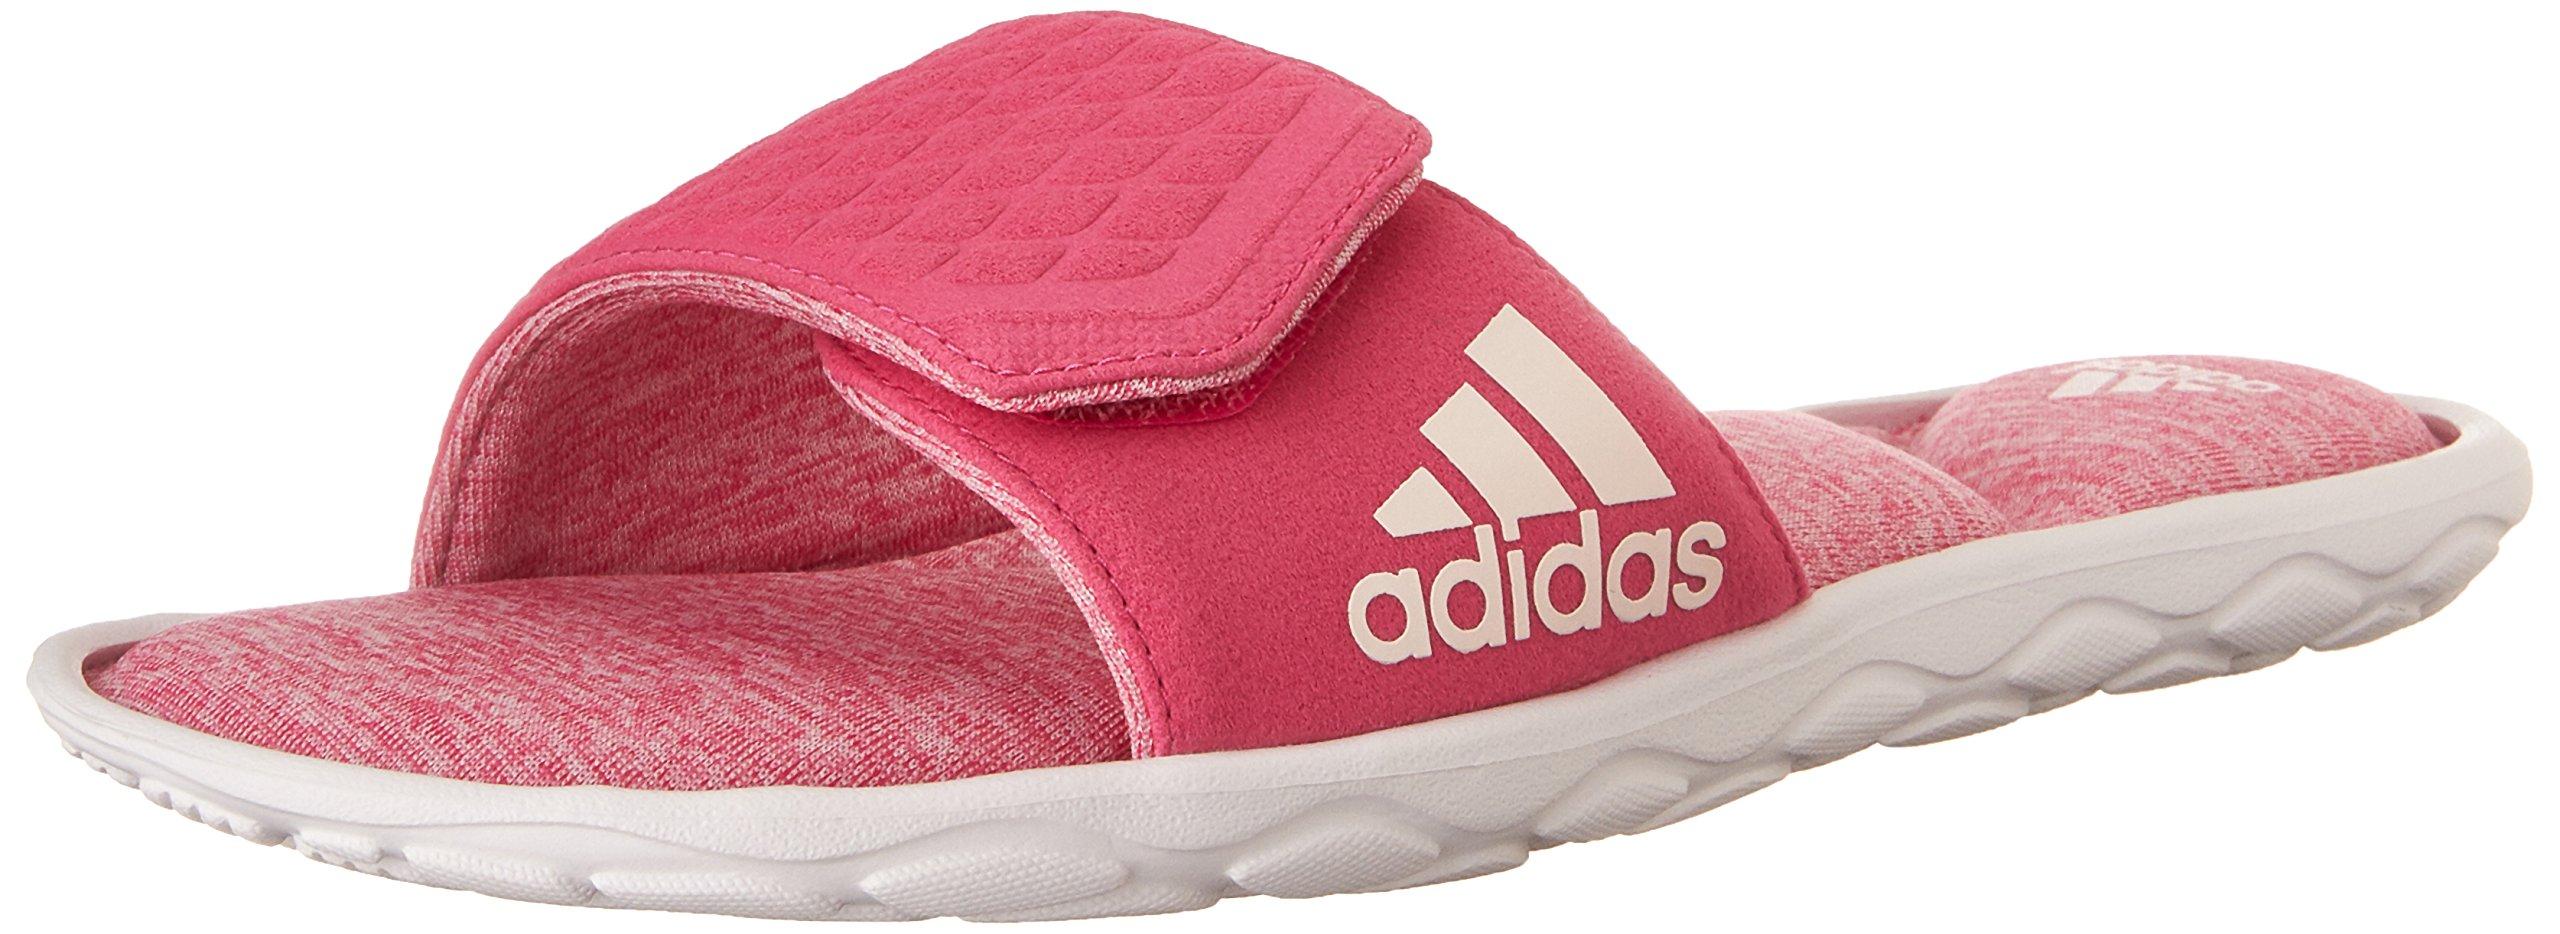 baf95a5de Galleon - Adidas Performance Women s Anyanda Flex Slide W Athletic Sandal